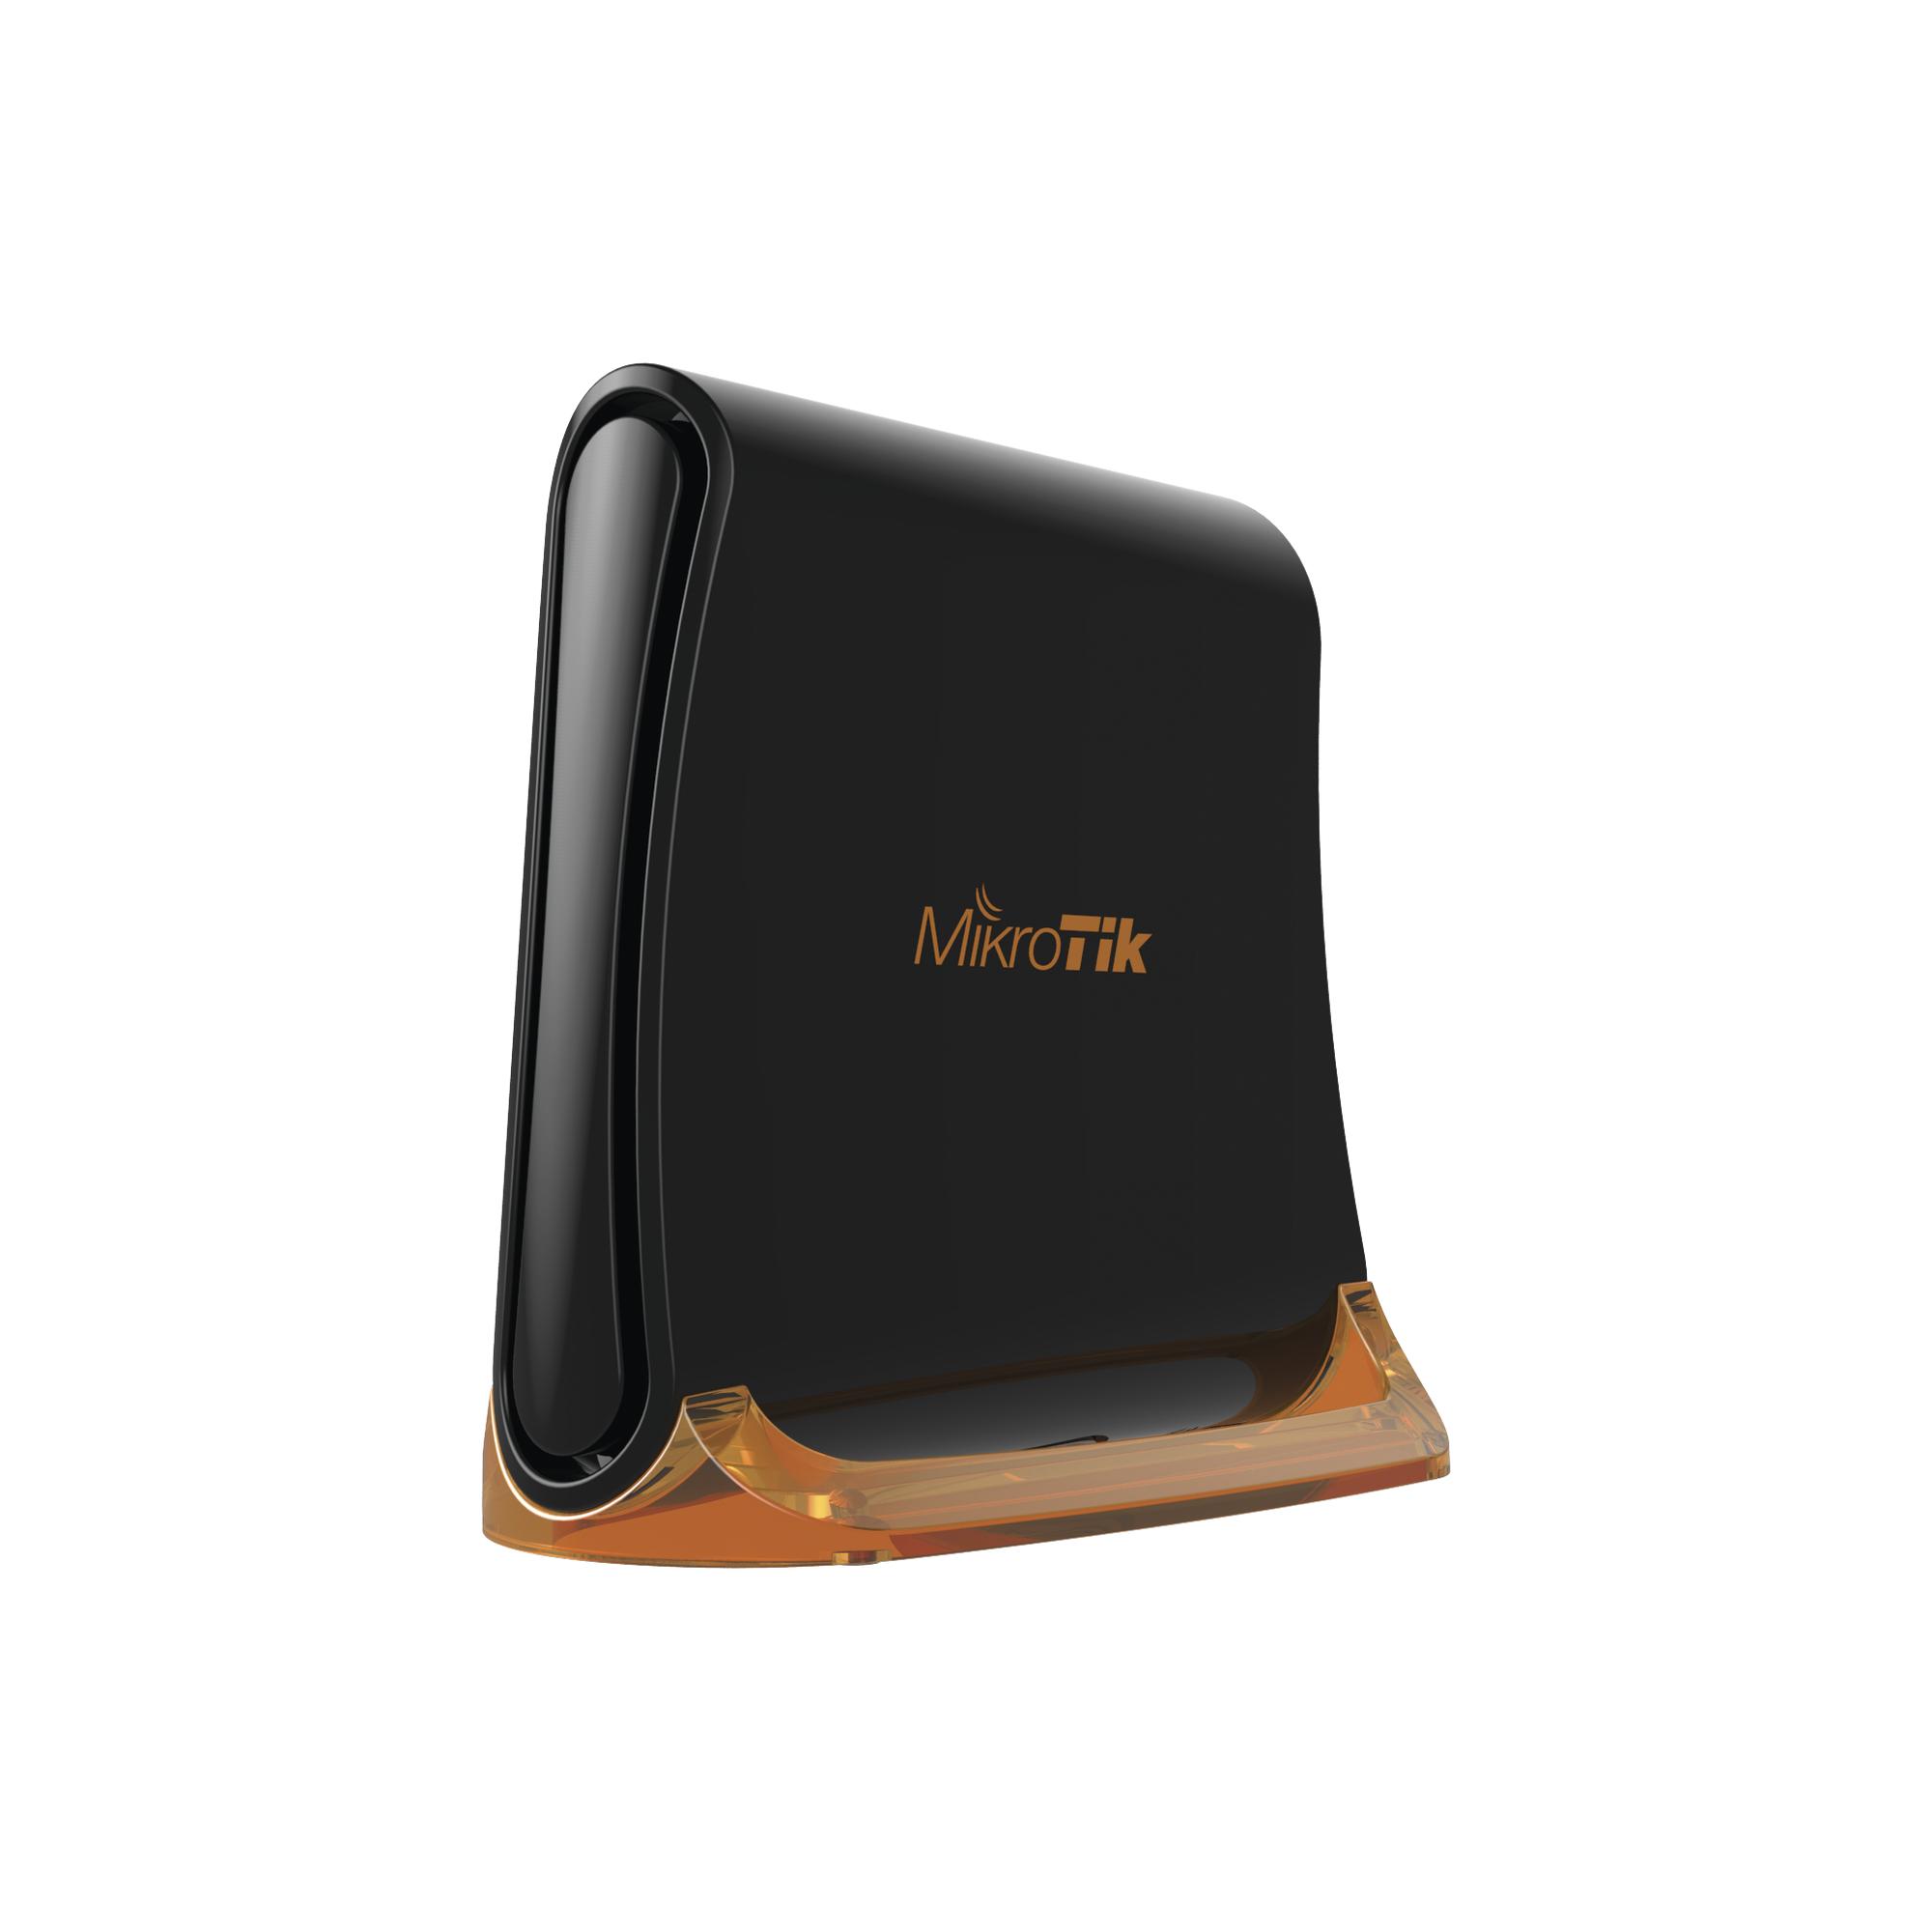 (hAP mini) Router 3 puertos 10/100 Mbps, Wi-Fi 2.4 GHz 802.11 b/g/n, Antena 360? 1.5 dBi, hasta 158 mW de potencia